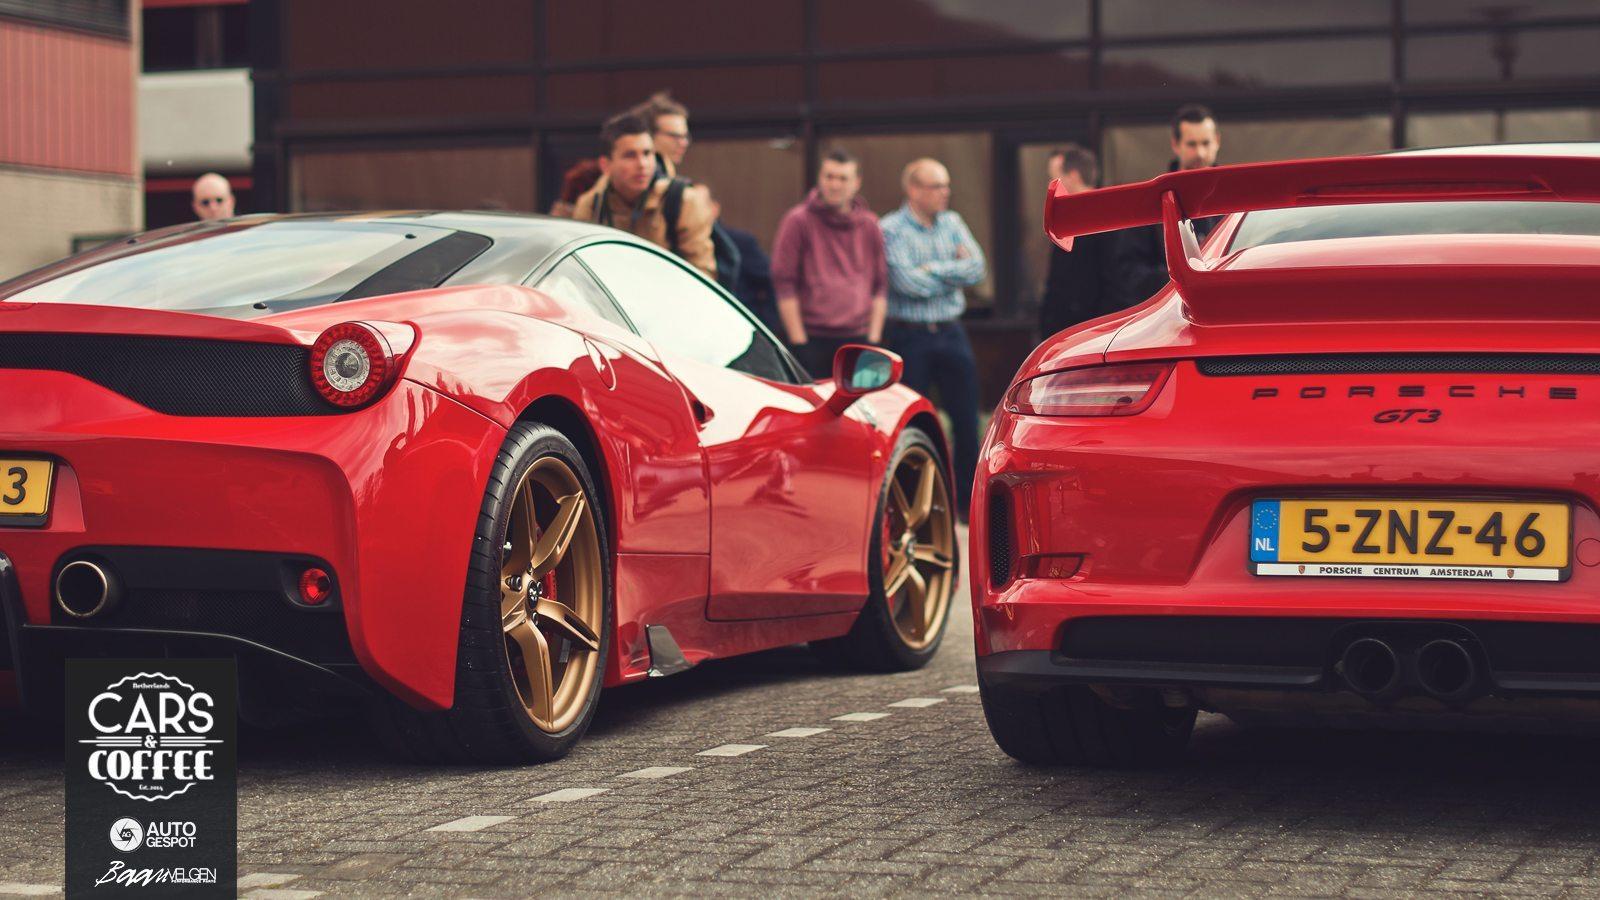 Cars & Coffee Dordrecht